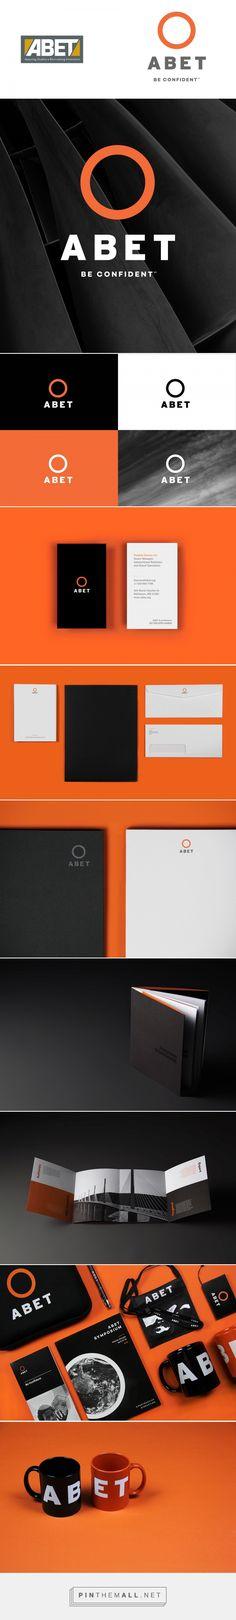 Brand New: New Logo and Identity for ABET by Ashton Design